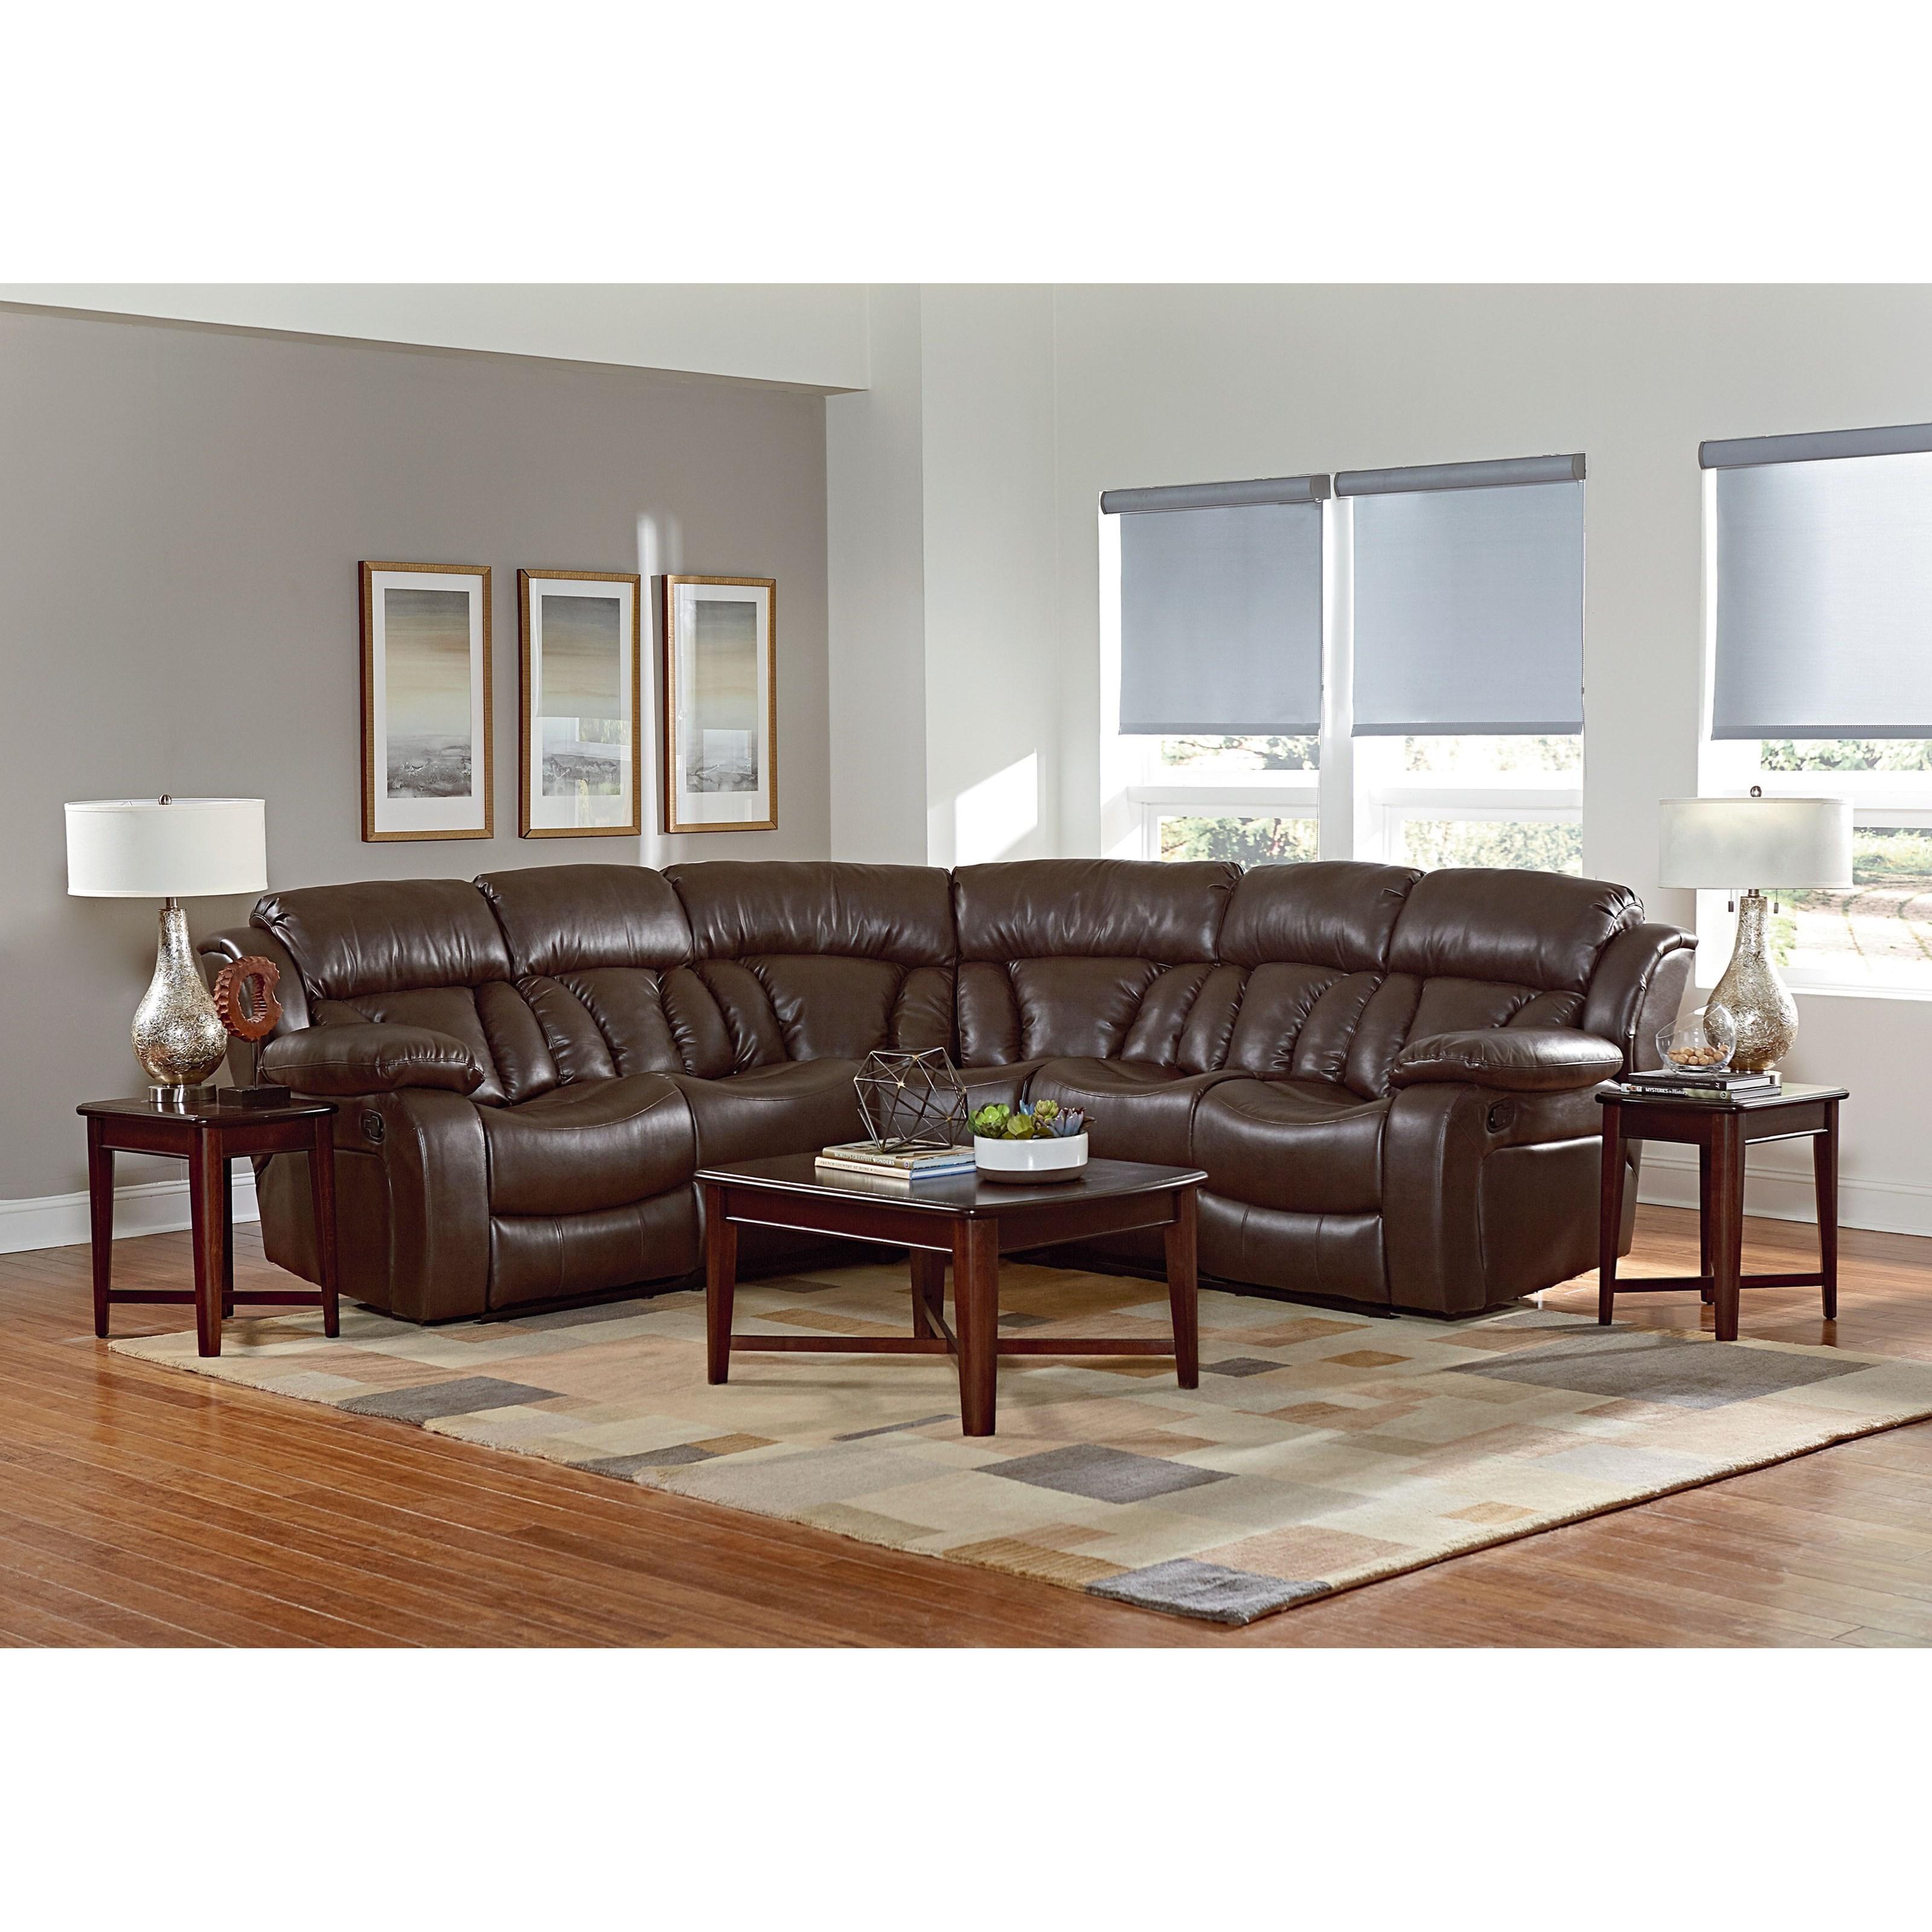 north shore living room set fresh on trend home decor